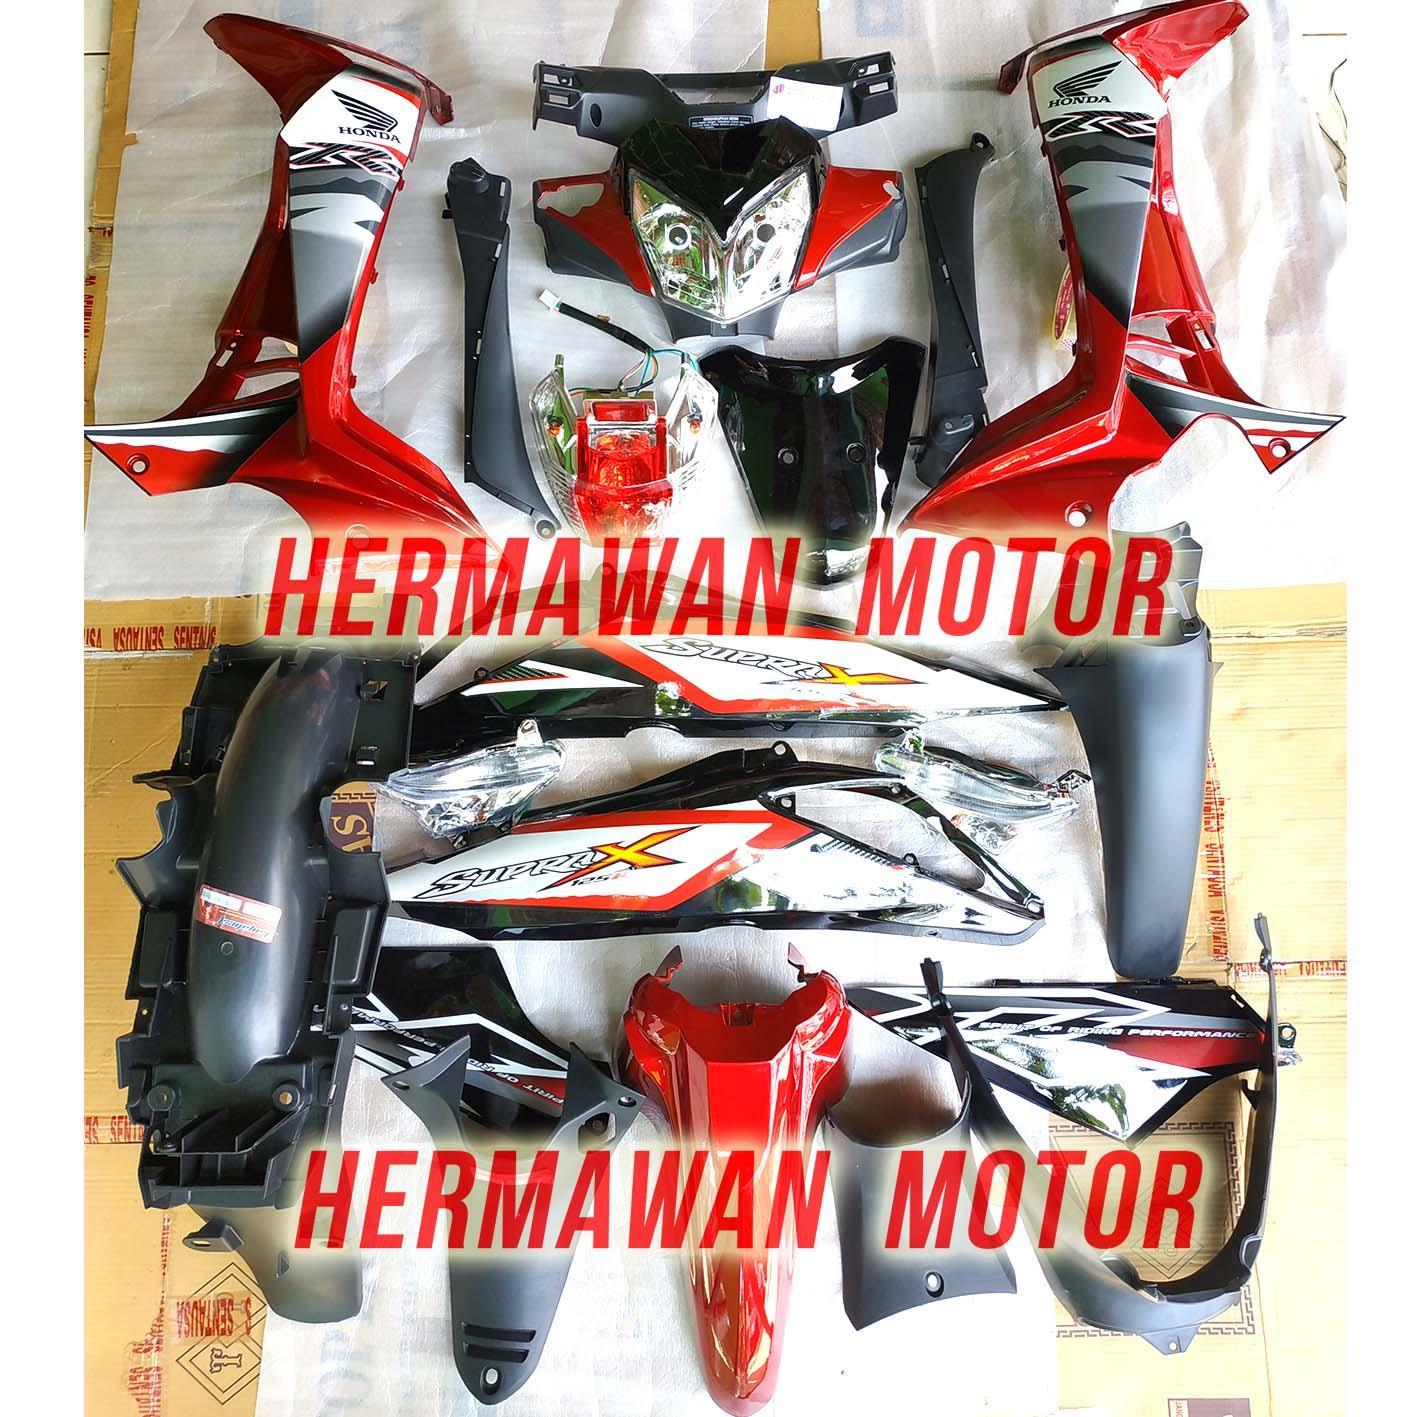 Full satu motor dan lampu Honda supra x 125 th 2007-2013 warna merah marron